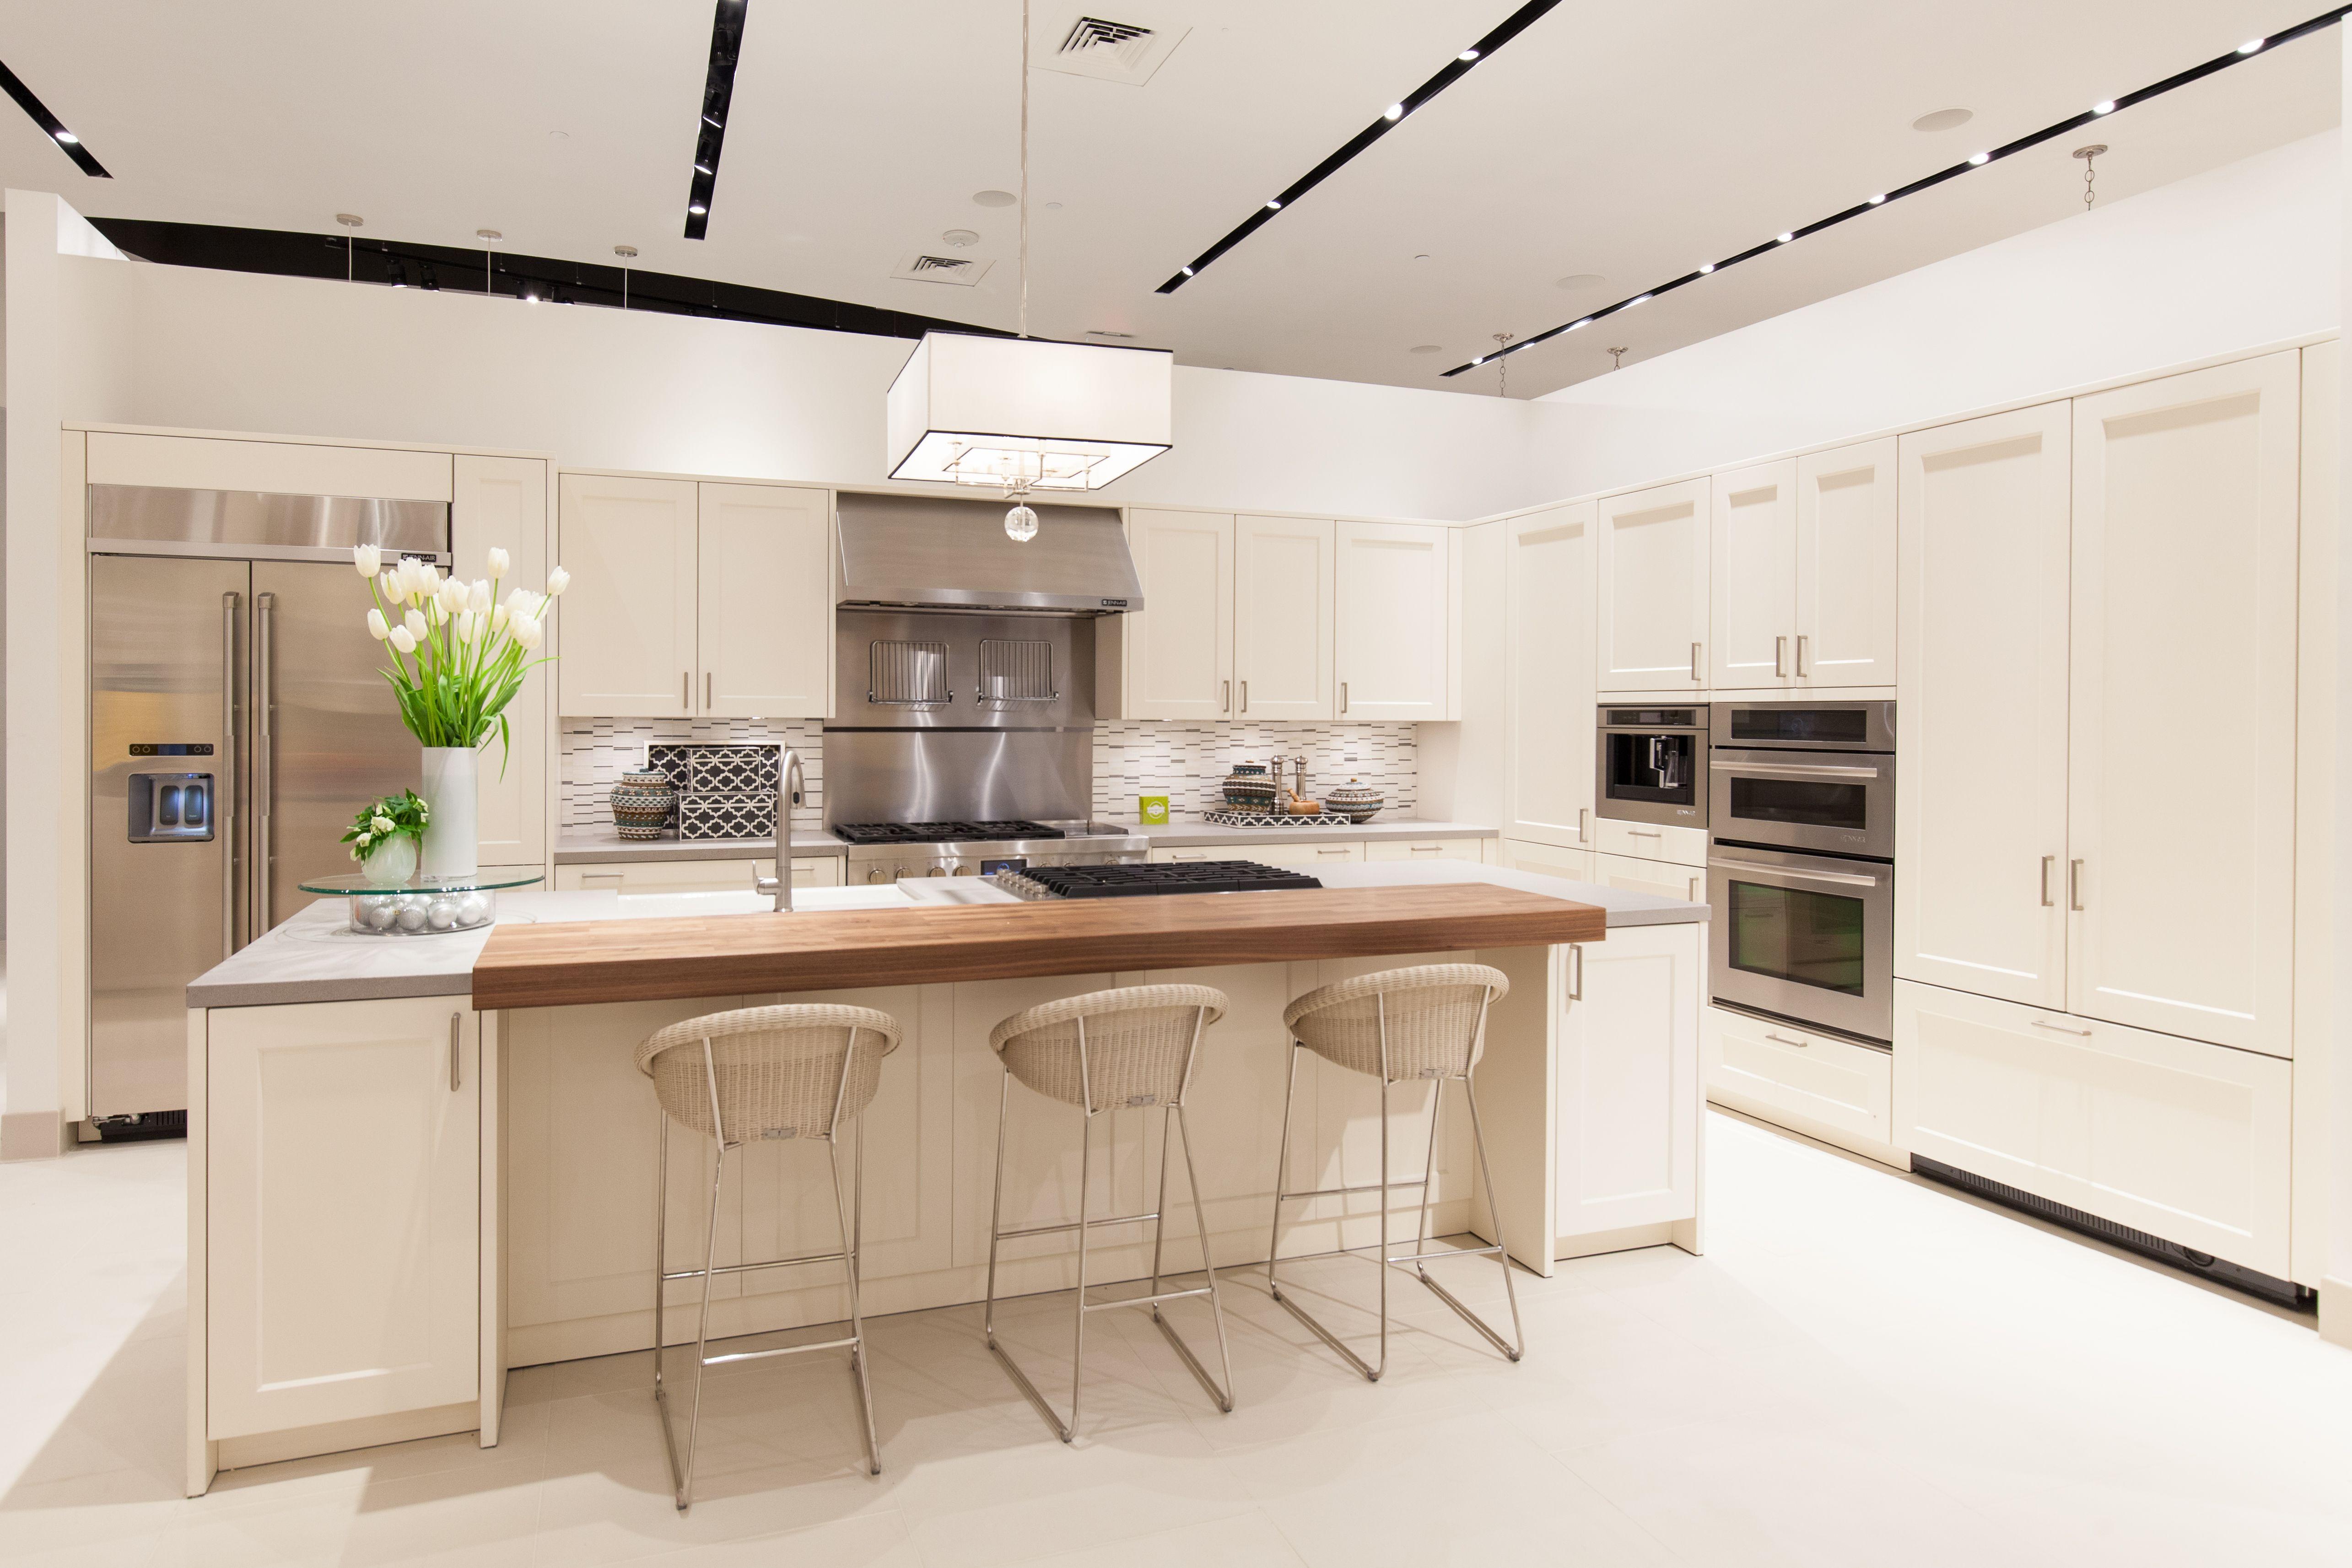 kitchen display at pirch atlanta featuring sub zero wolf